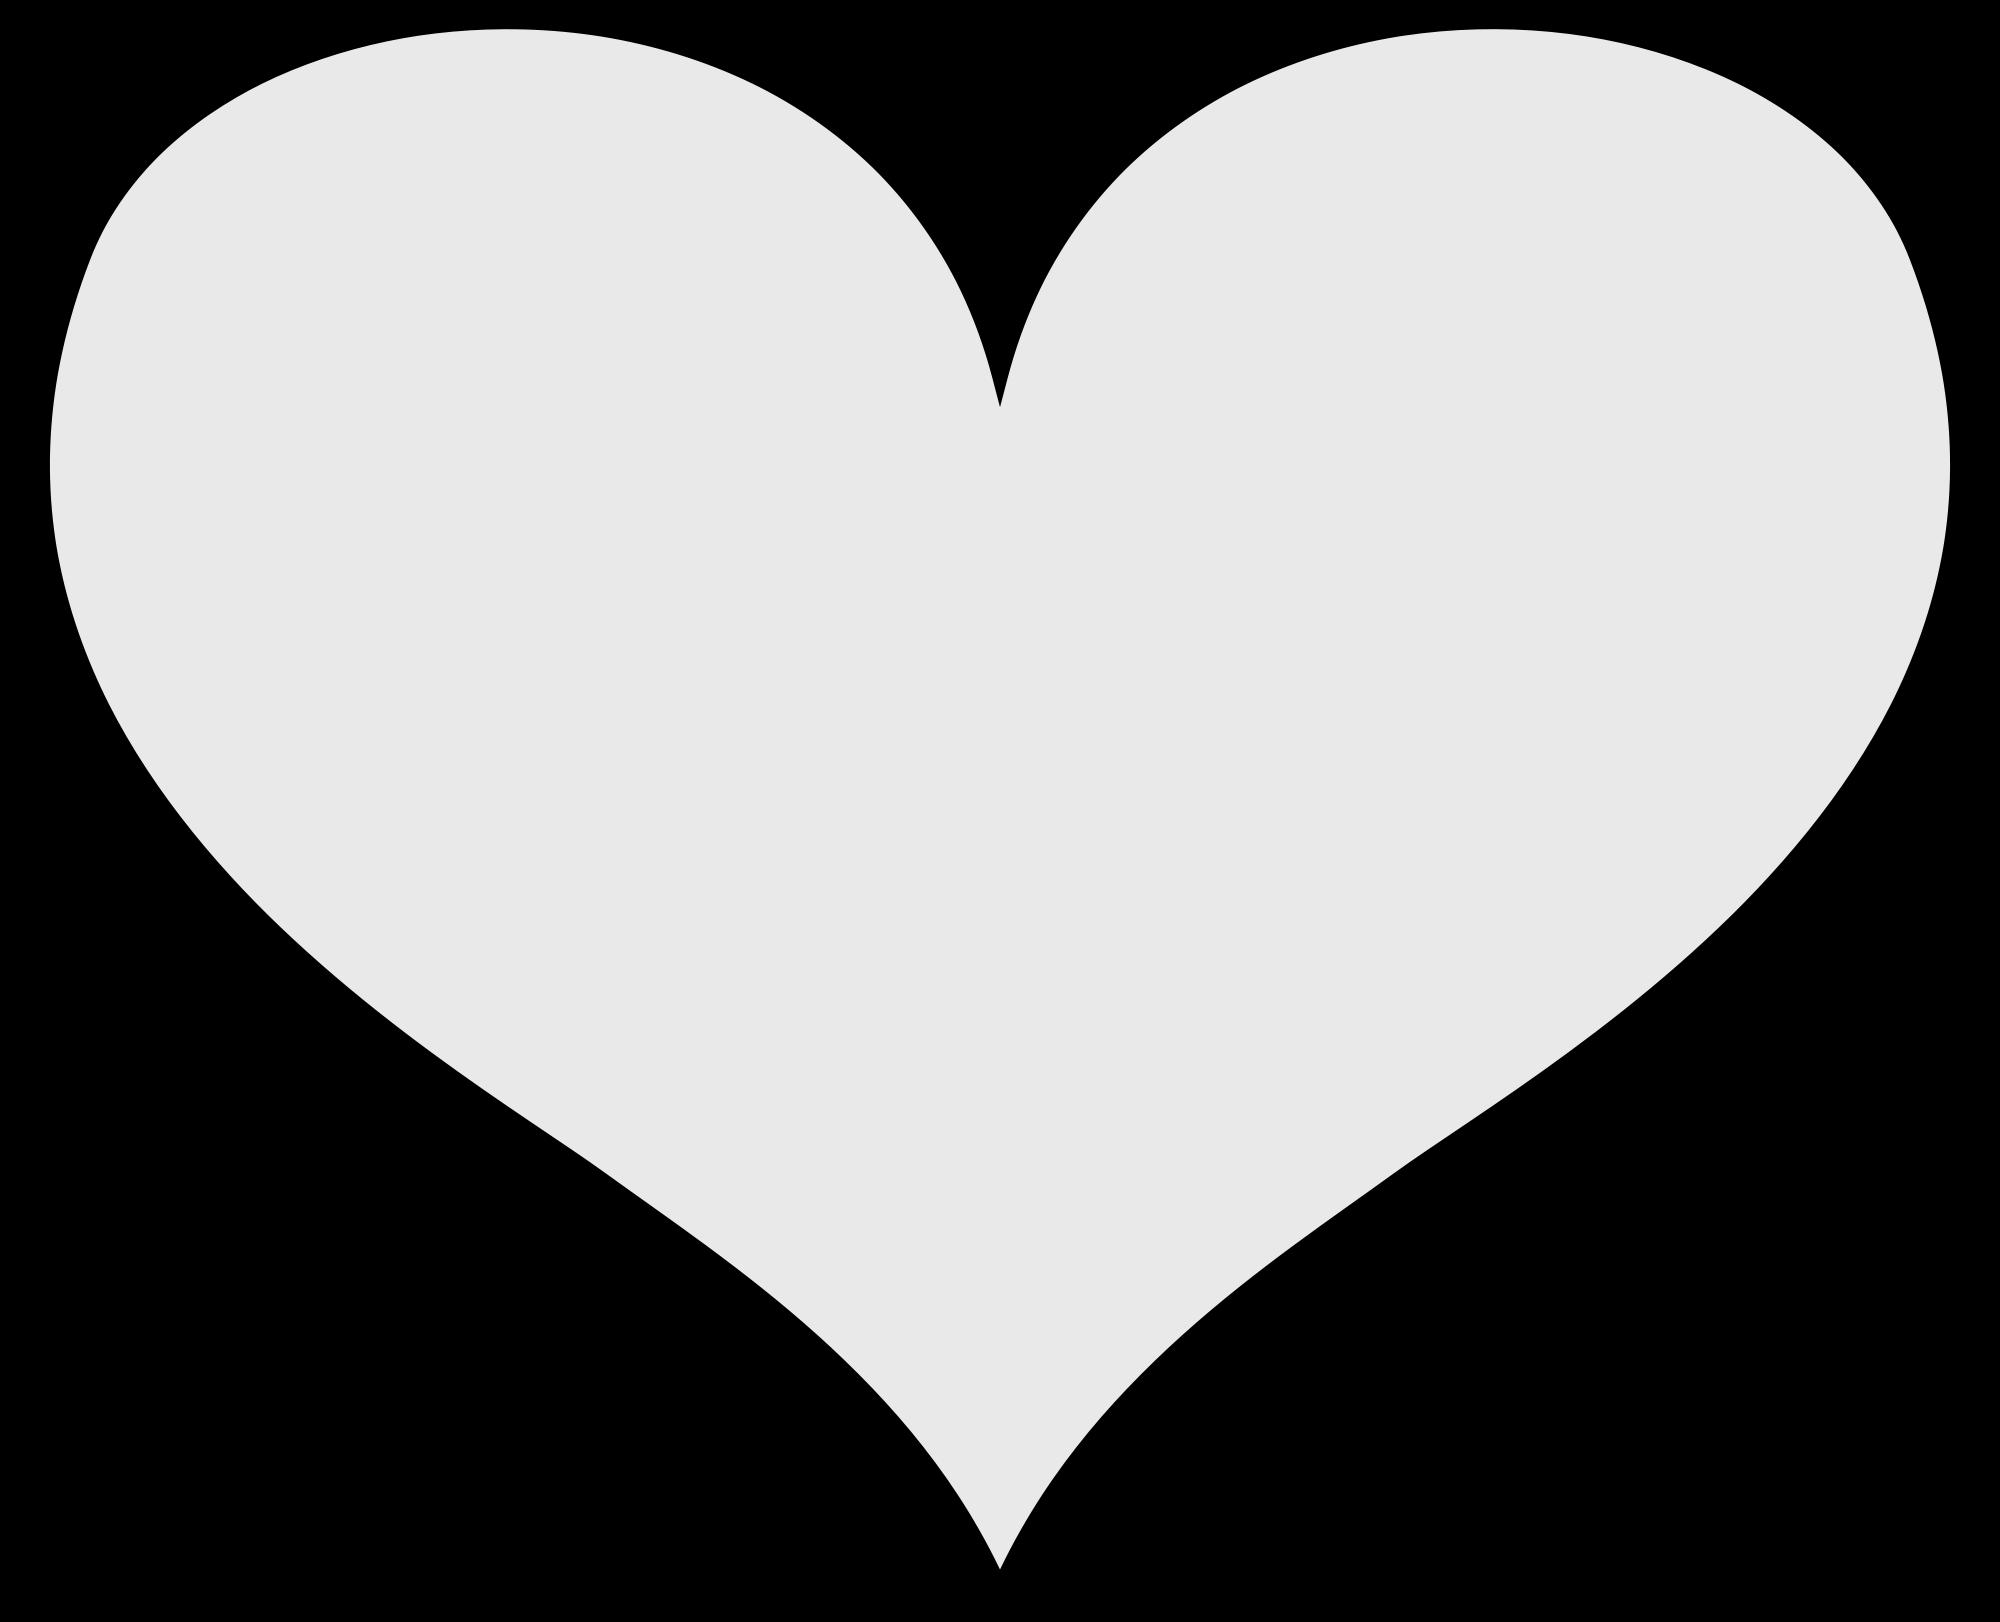 2000x1622 Svg Outline Heart Clipart Download